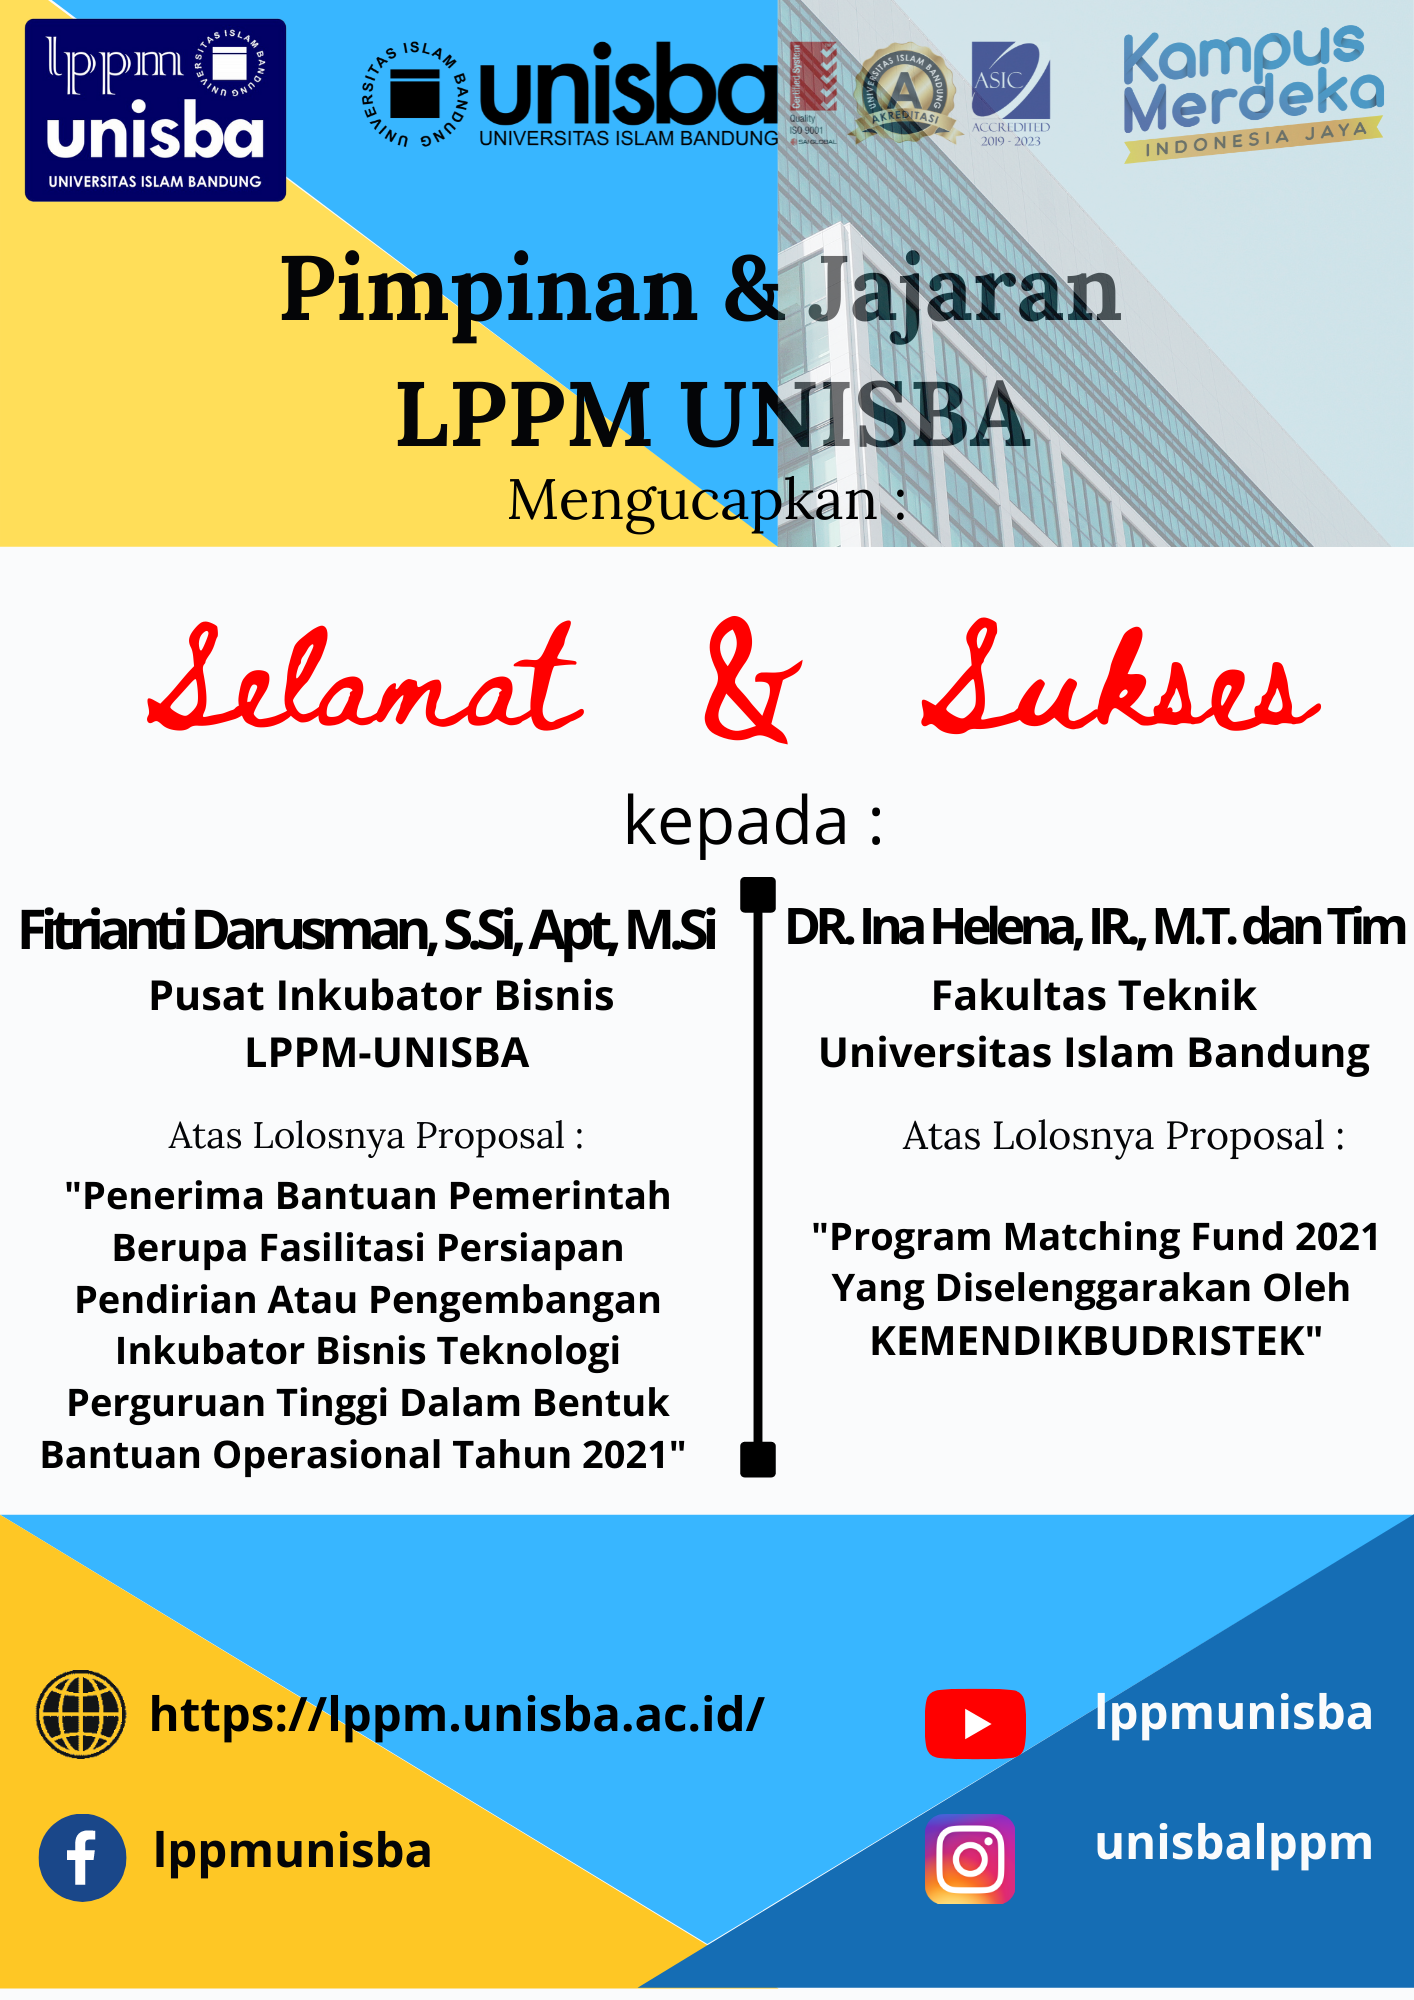 Pimpinan dan Jajaran LPPM UNISBA mengucapkan Selamat & Sukses kepada Pemenang Hibah Tahun 2021